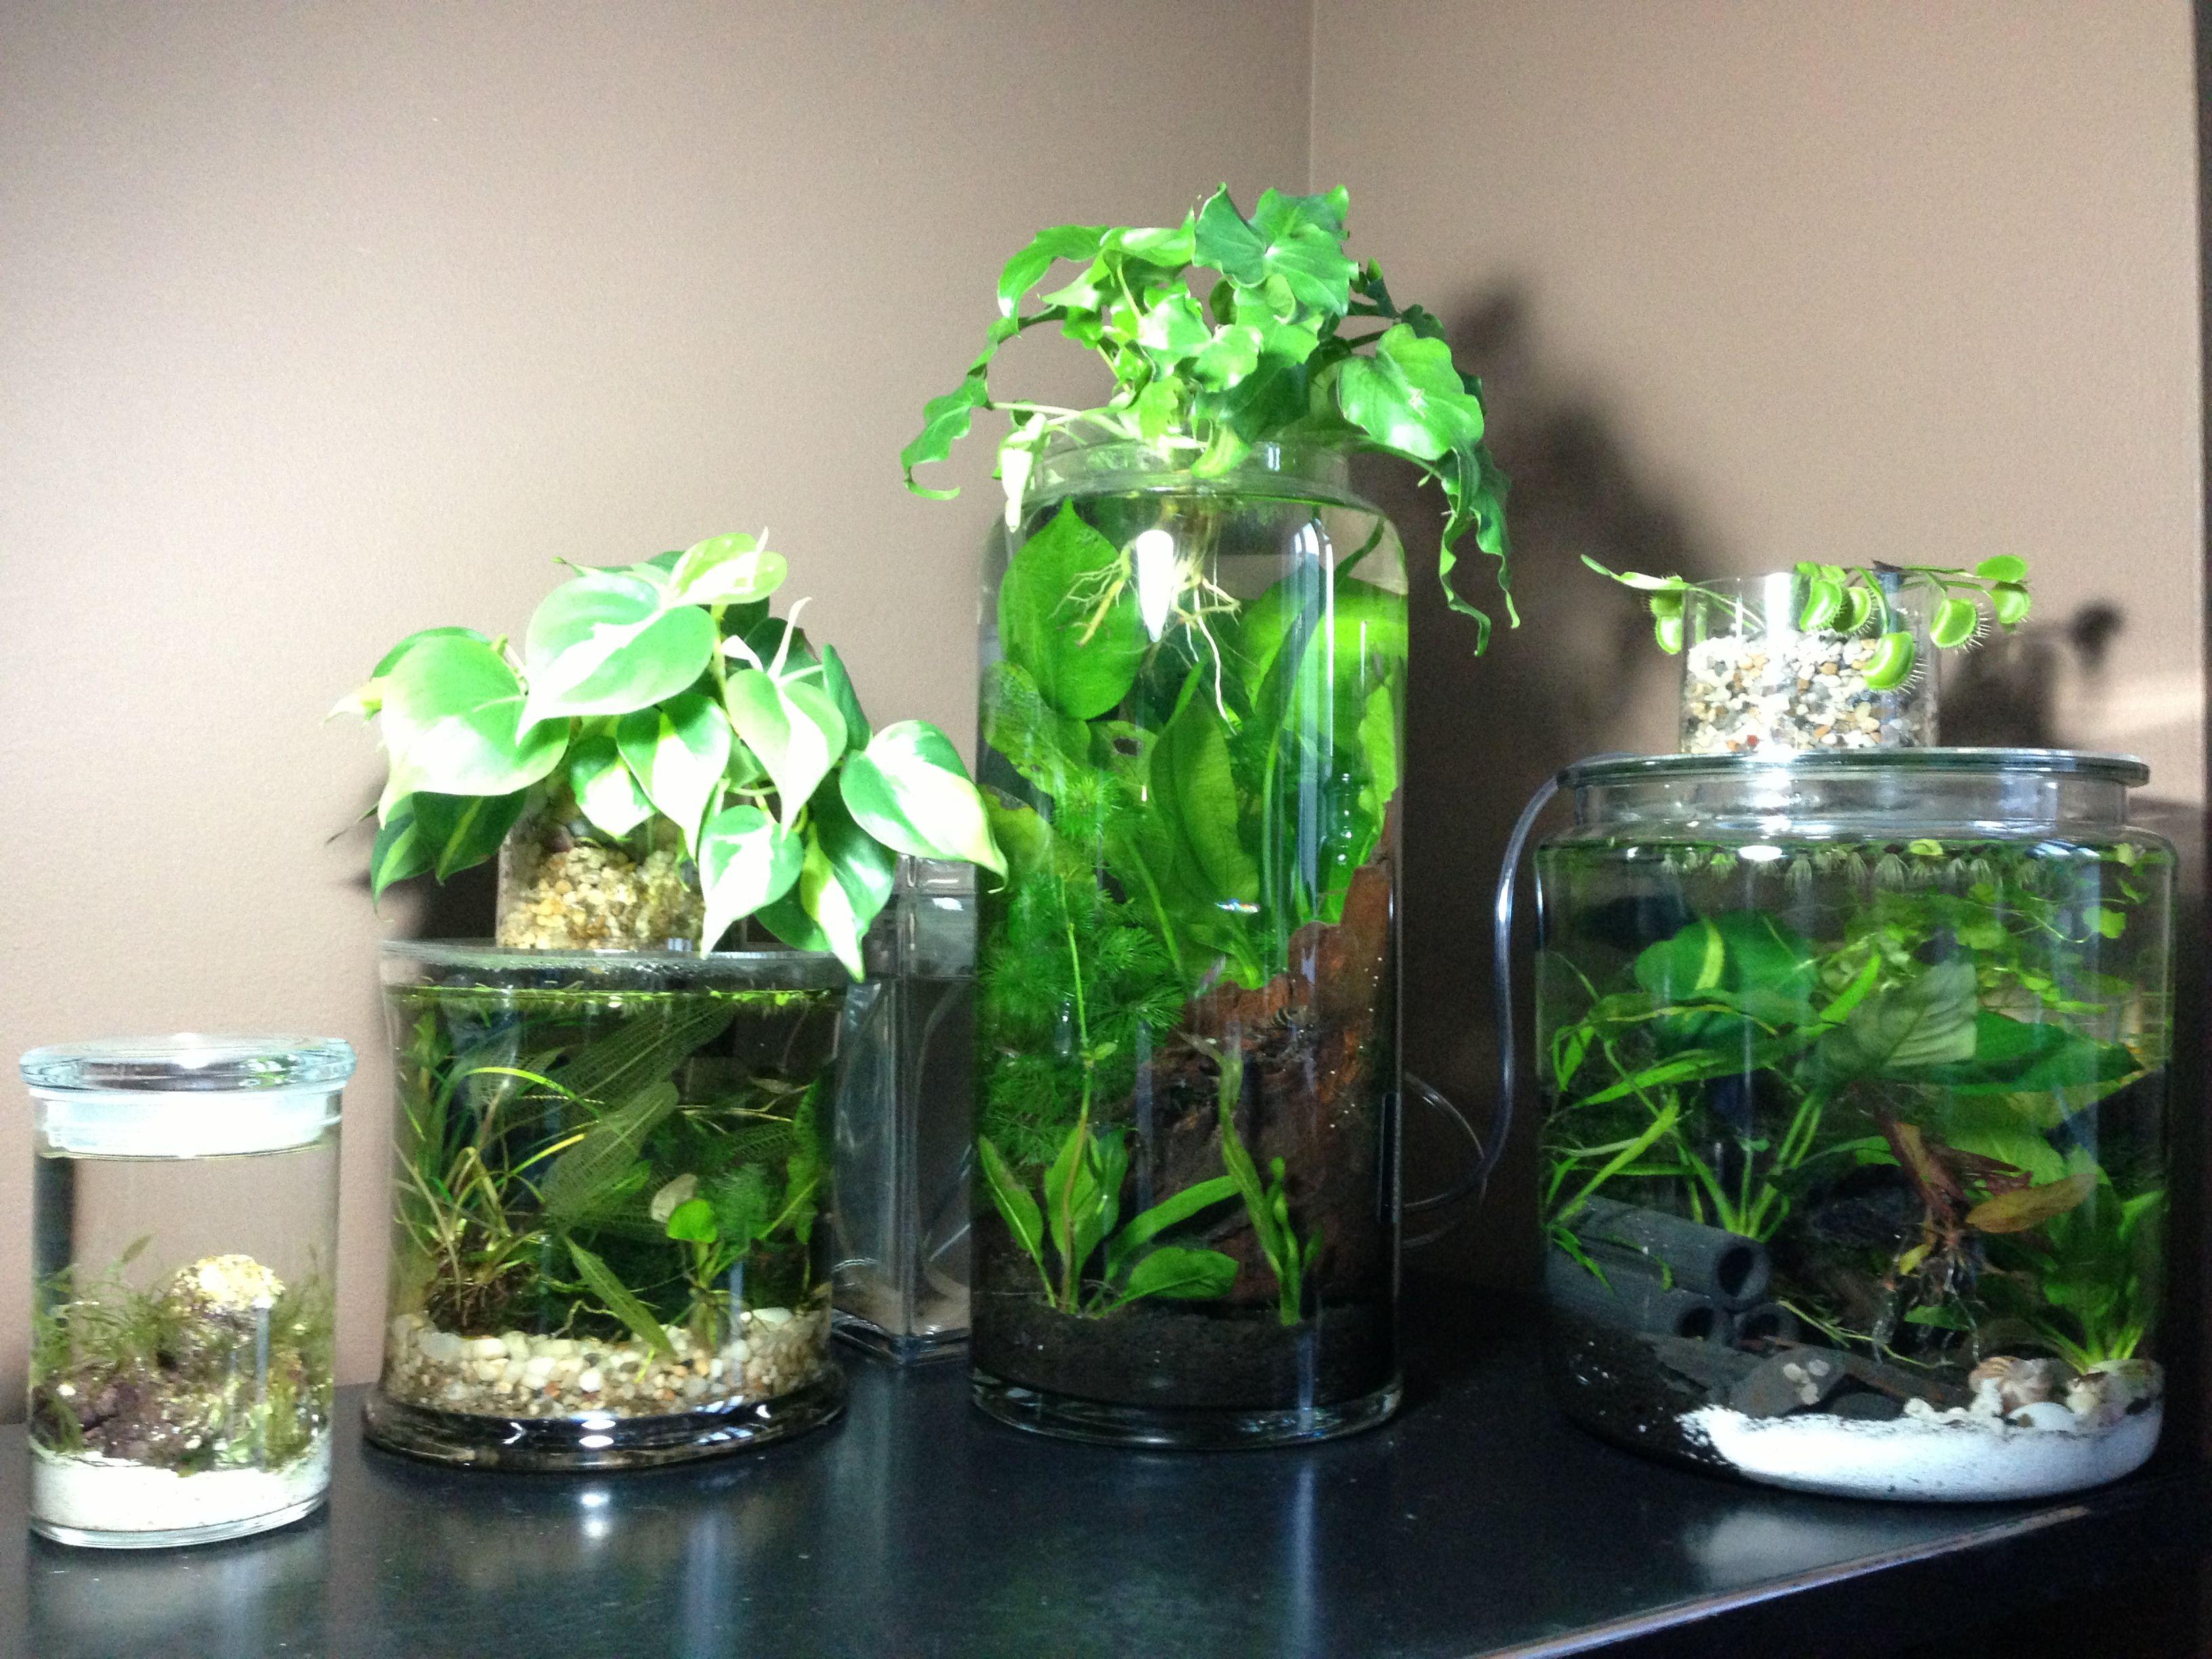 Vegetarian freshwater aquarium fish - 1 Saltwater Jar Far Left And 3 Pico Freshwater Planted Tanks